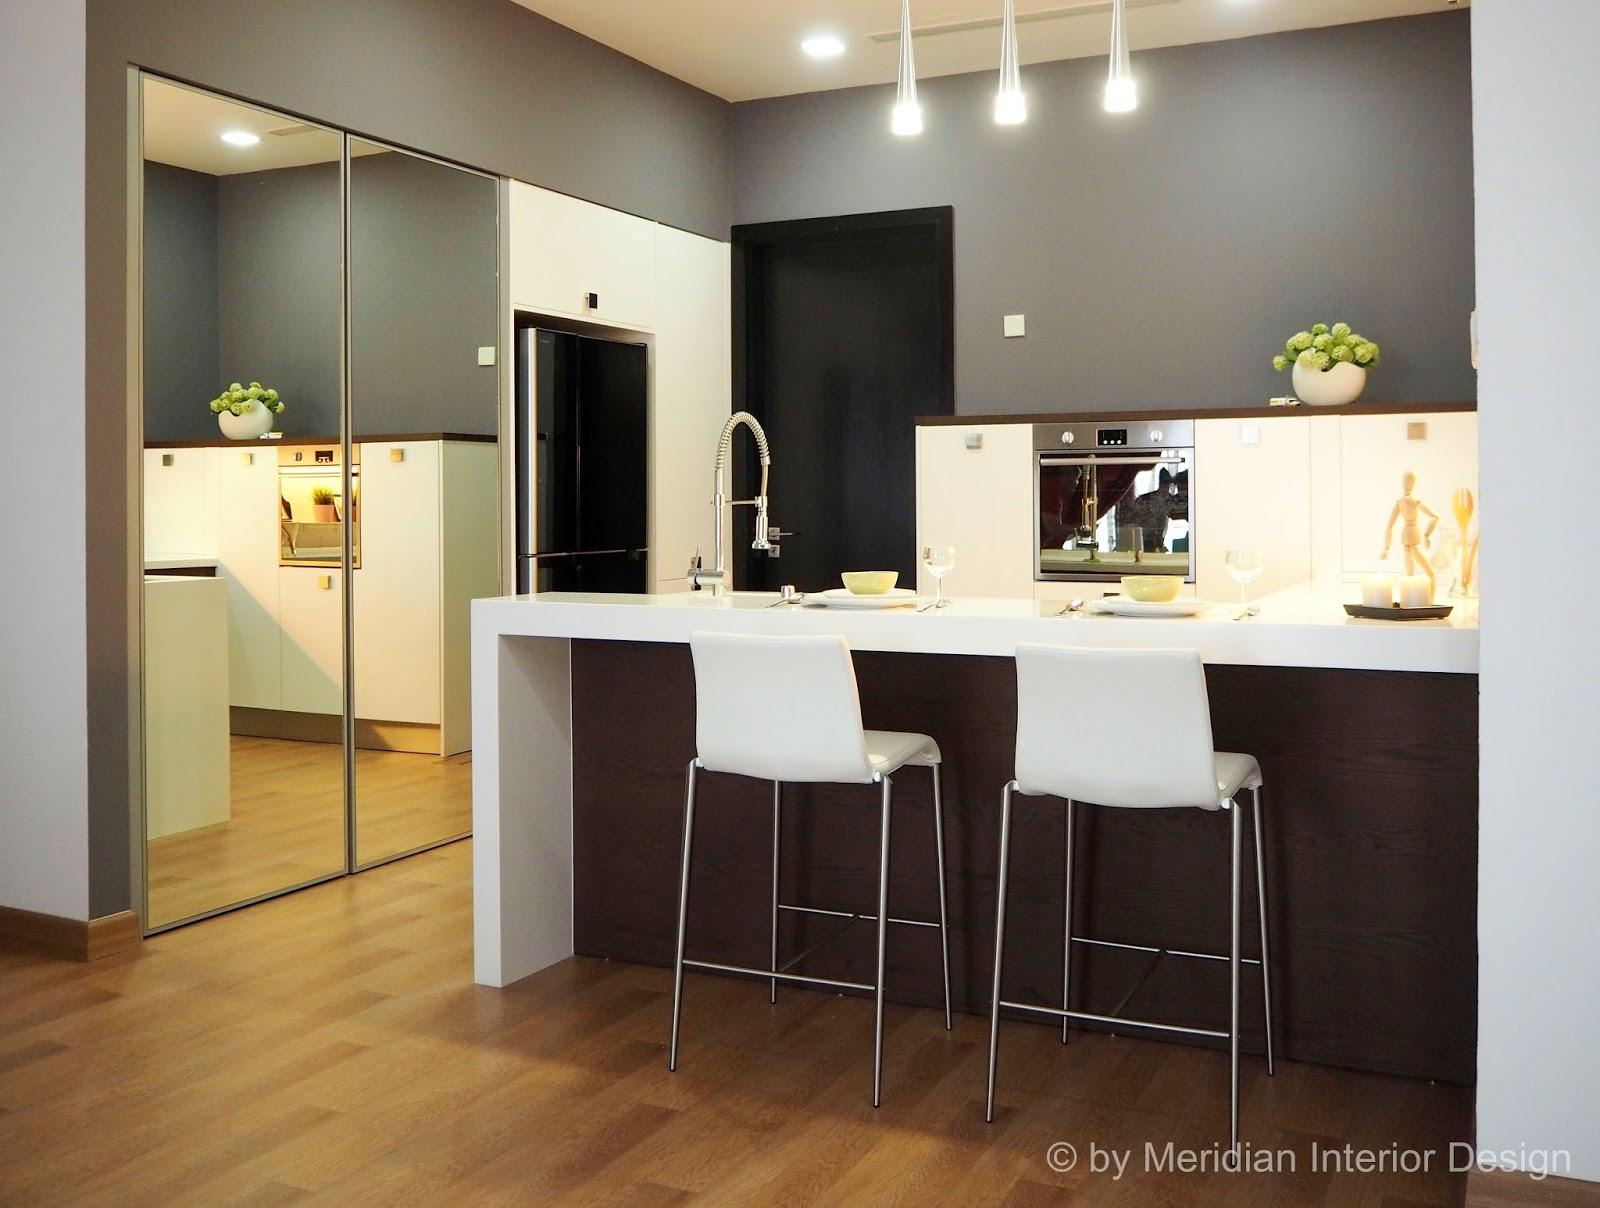 inspiration through creative interior designs: compact kitchen